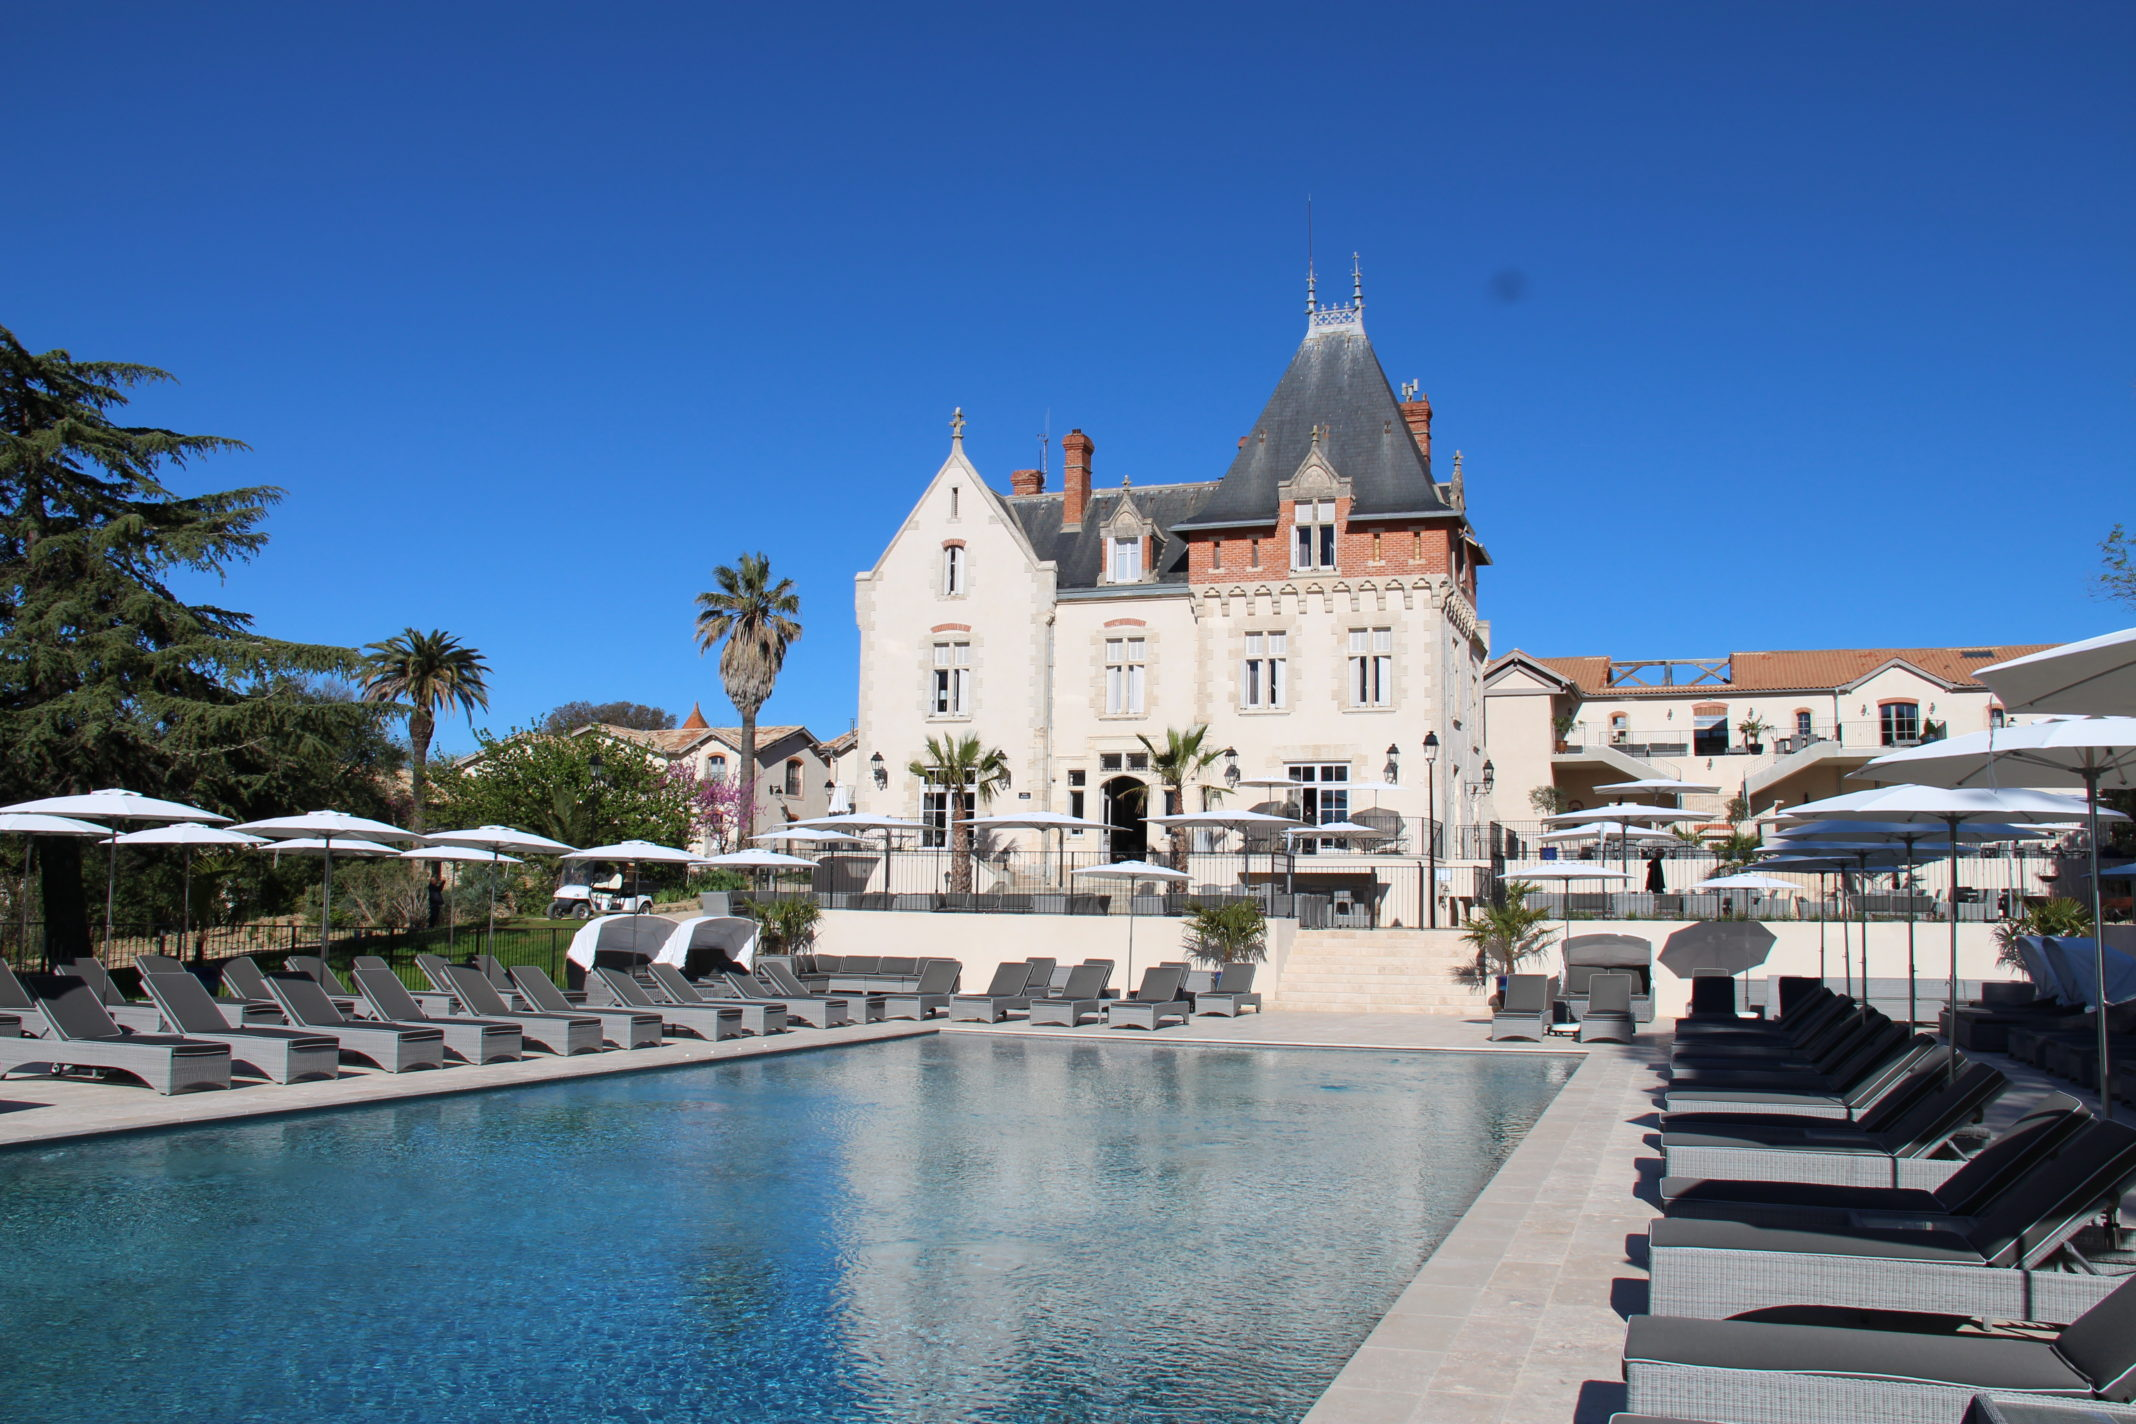 Chateau de Serjac - Family-vip